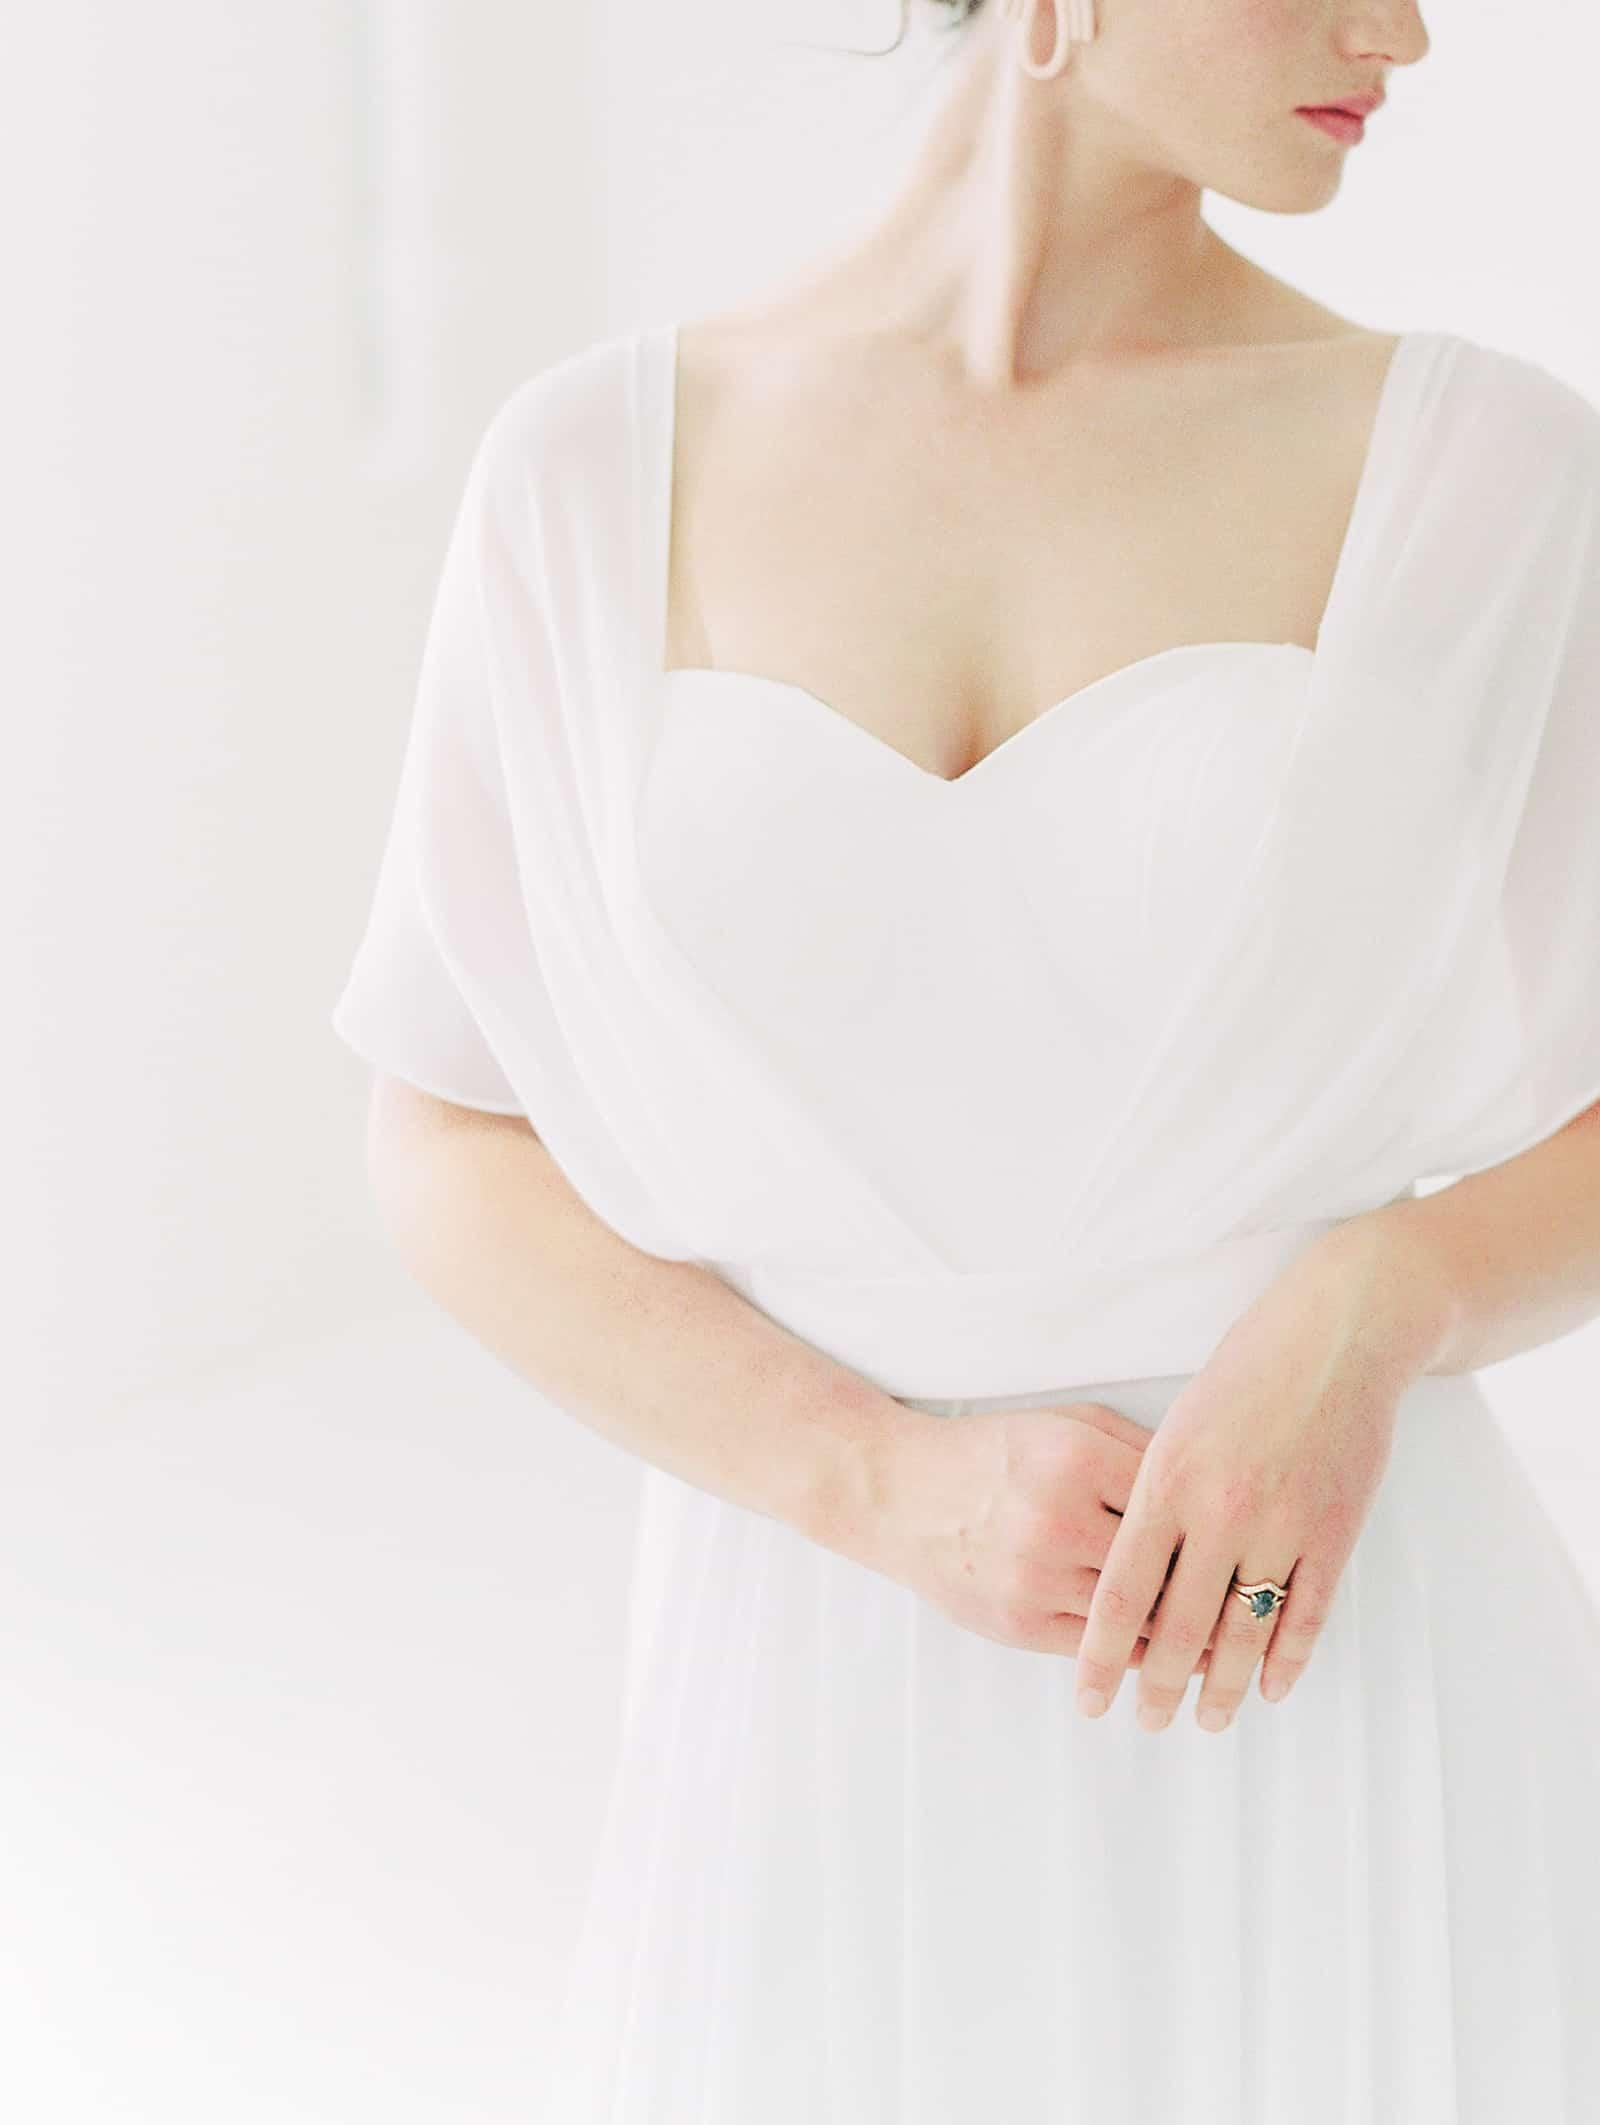 Modern wedding dress with sweetheart neckline